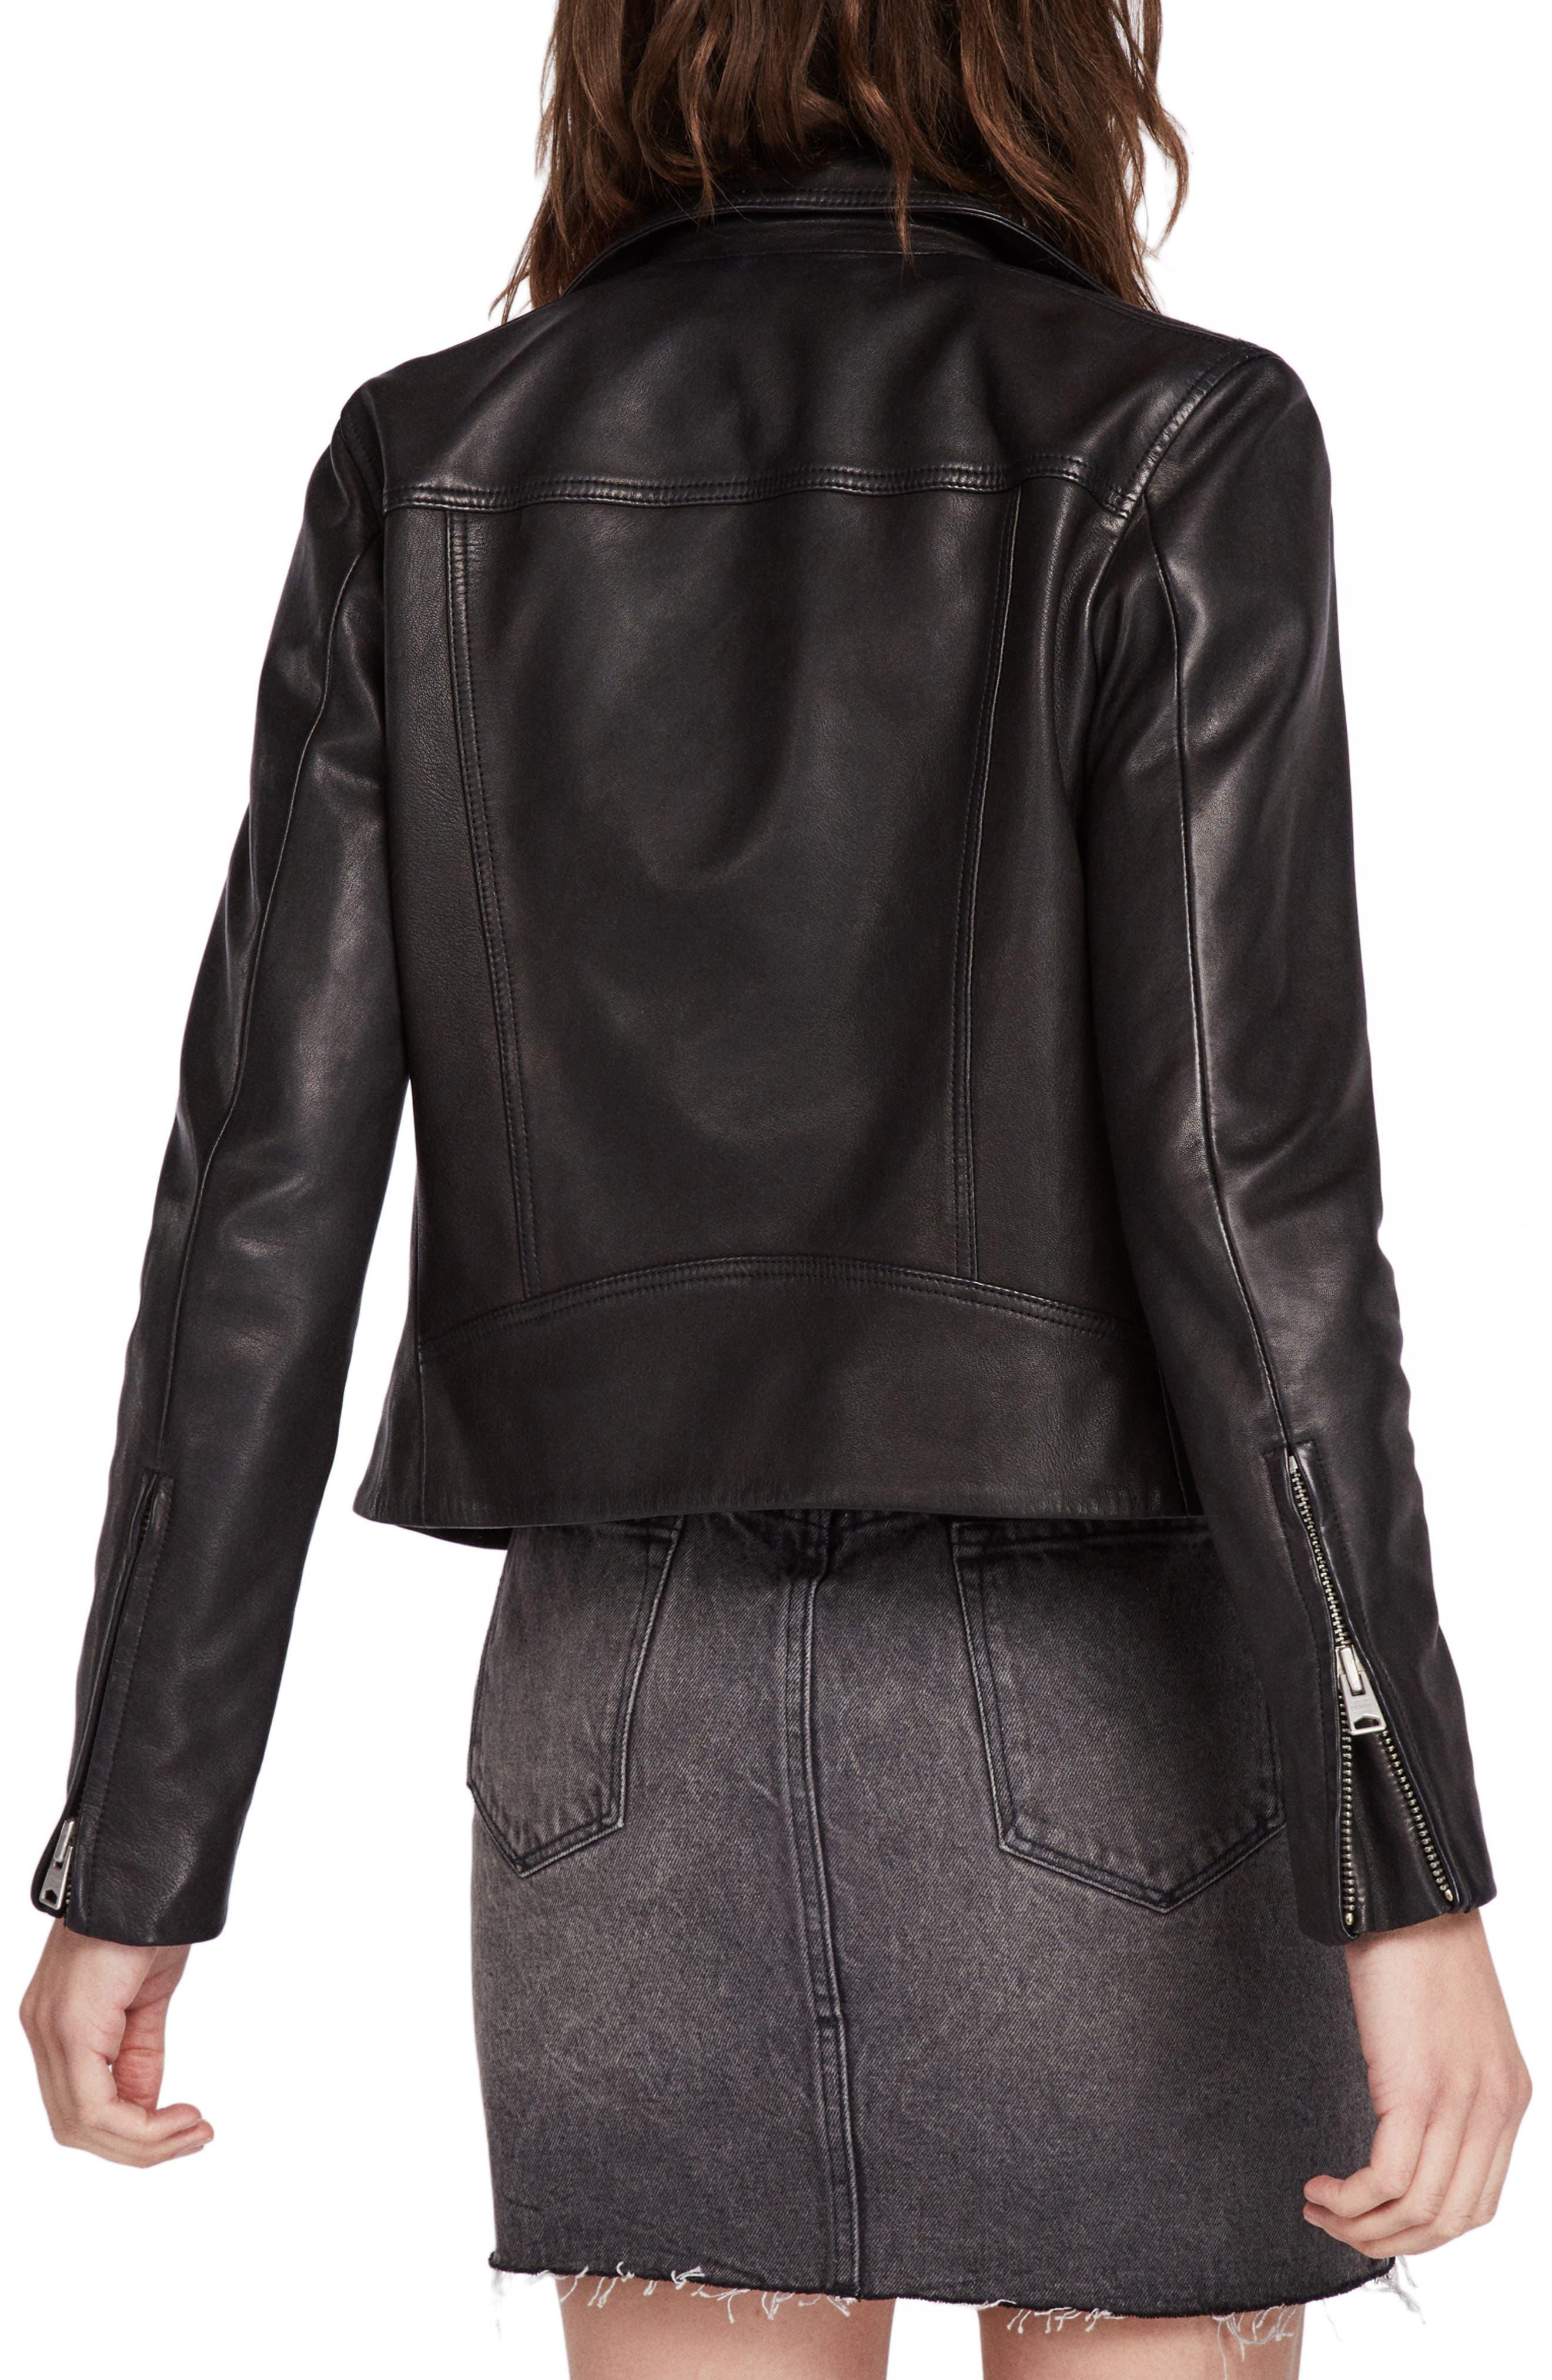 Dalby Biker Jacket,                             Alternate thumbnail 2, color,                             BLACK